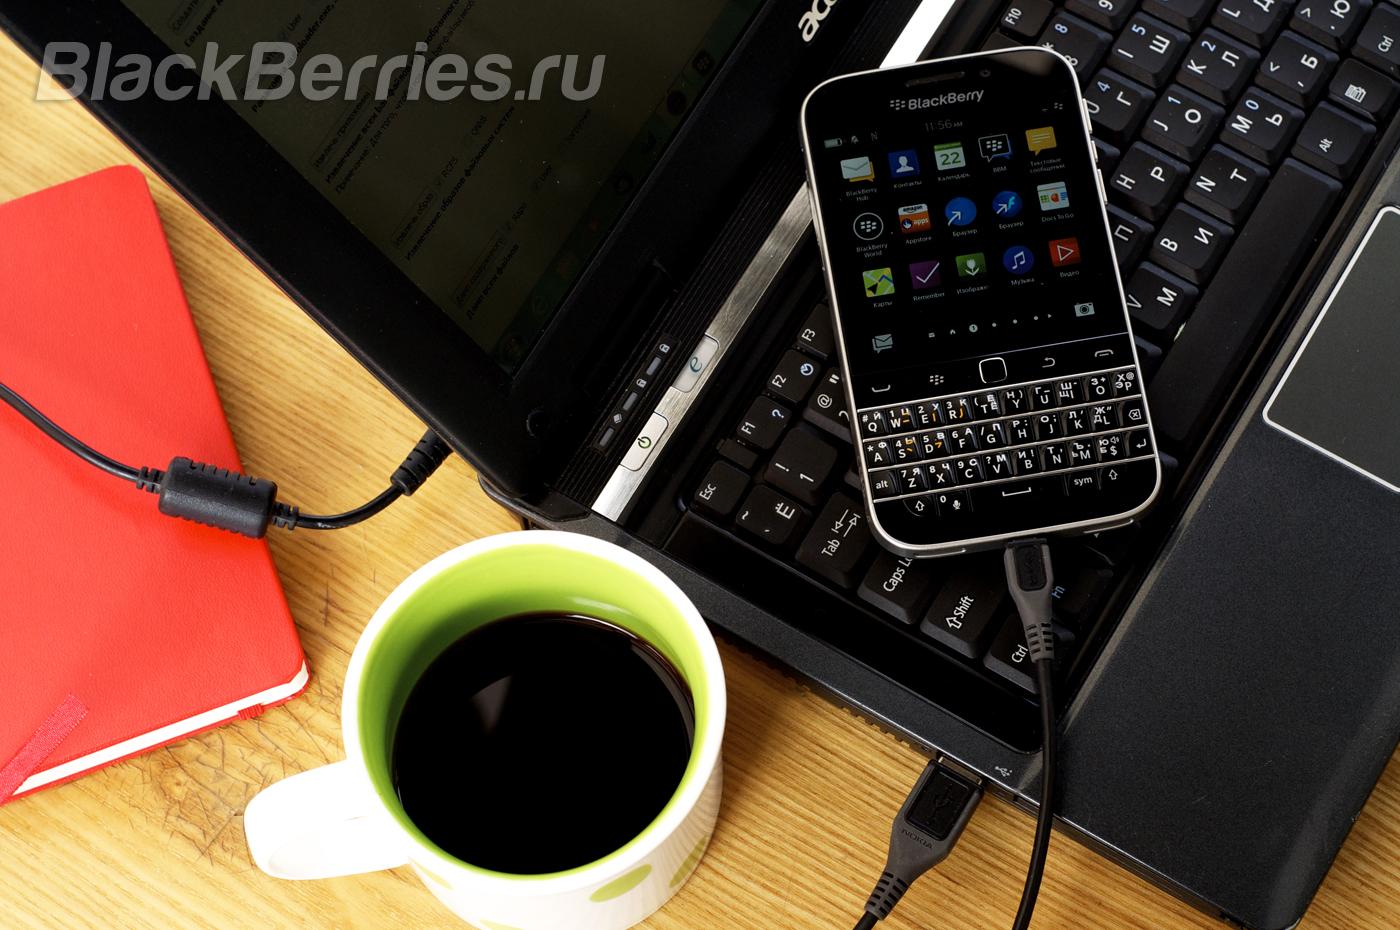 blackberry-classic-update3